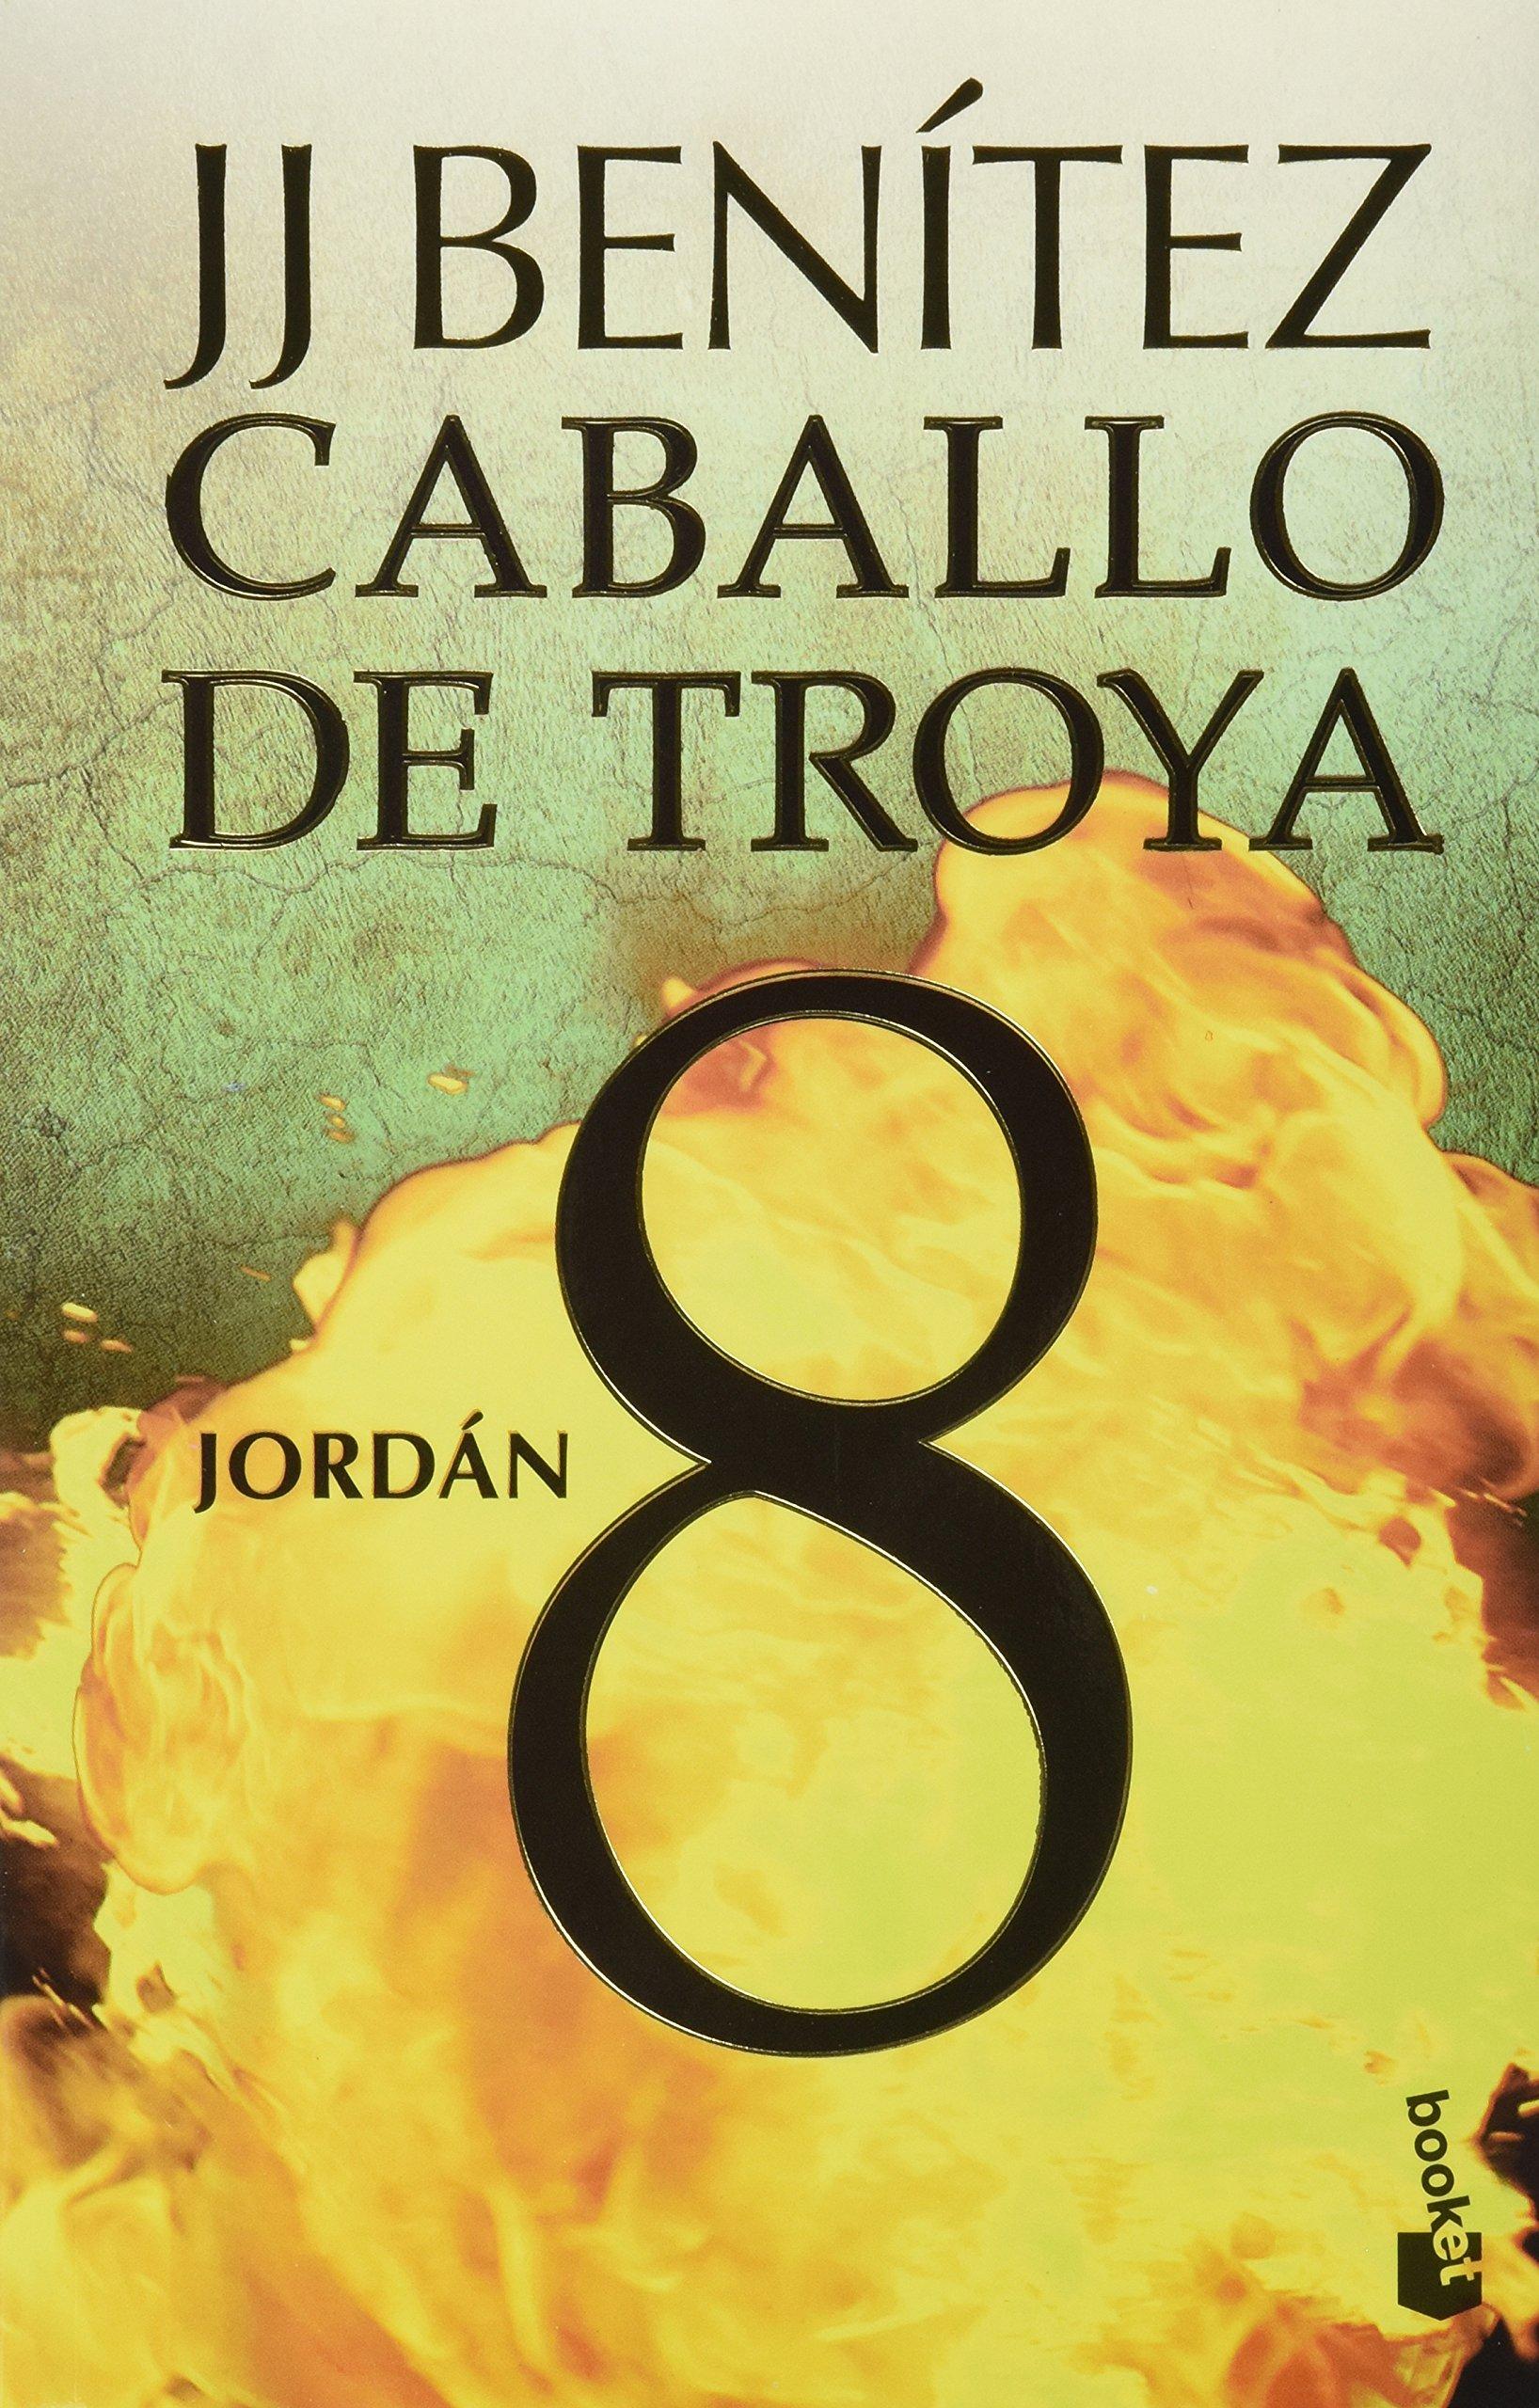 Caballo de Troya 8 (Nueva edic.): 1:J. J. Benítez: Amazon.com.mx: Libros